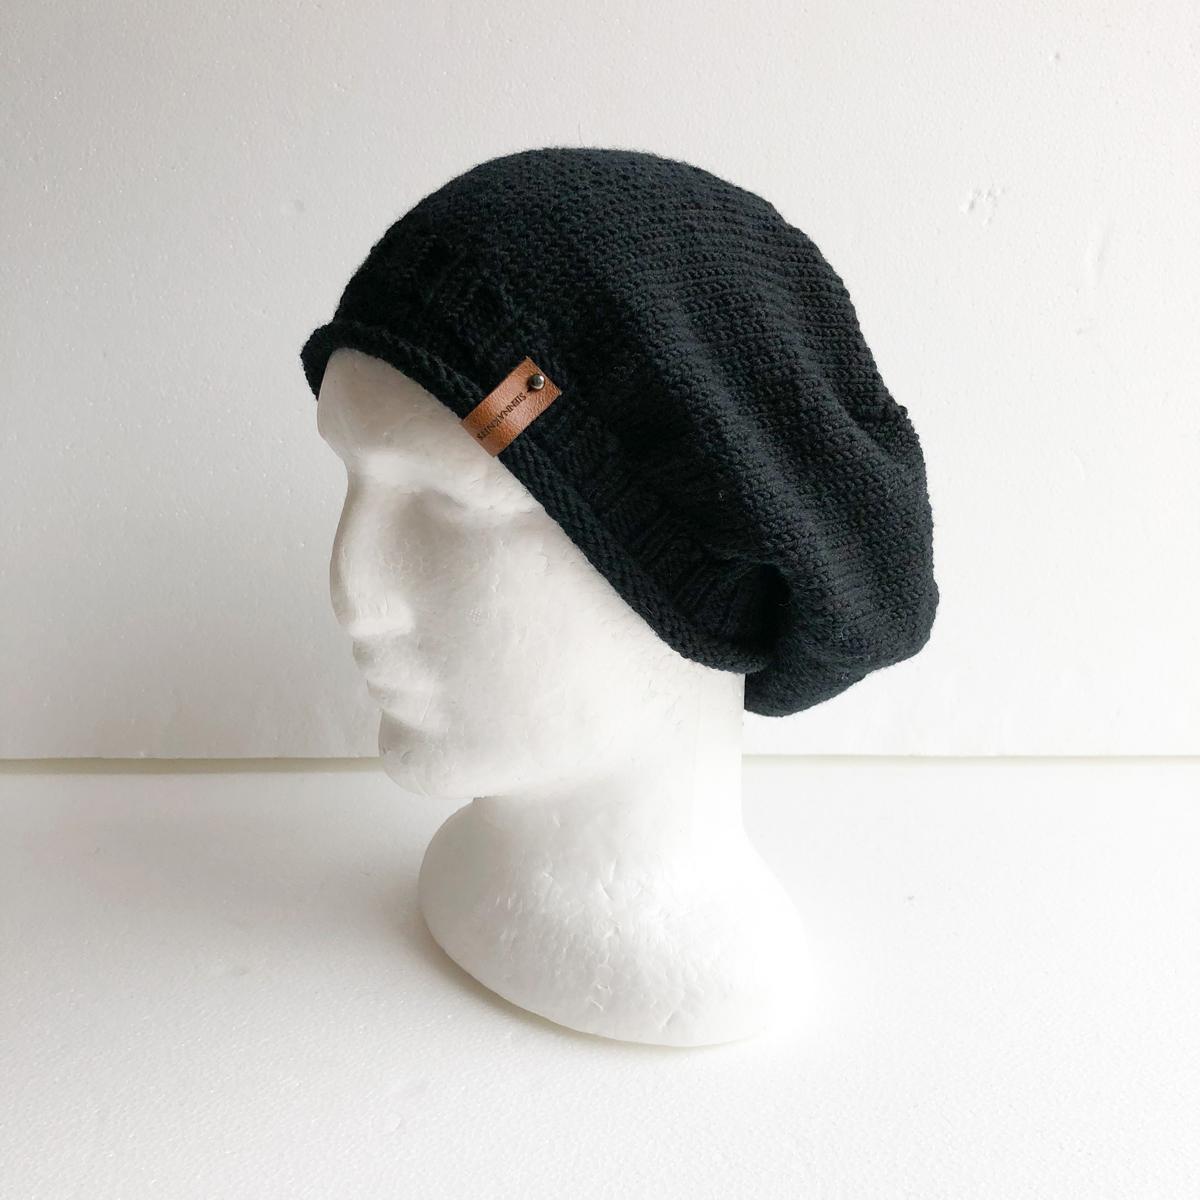 100% Merino Wool Black Knit Women Slouchy Beanie With Roll Up Brim By SiennaKnits